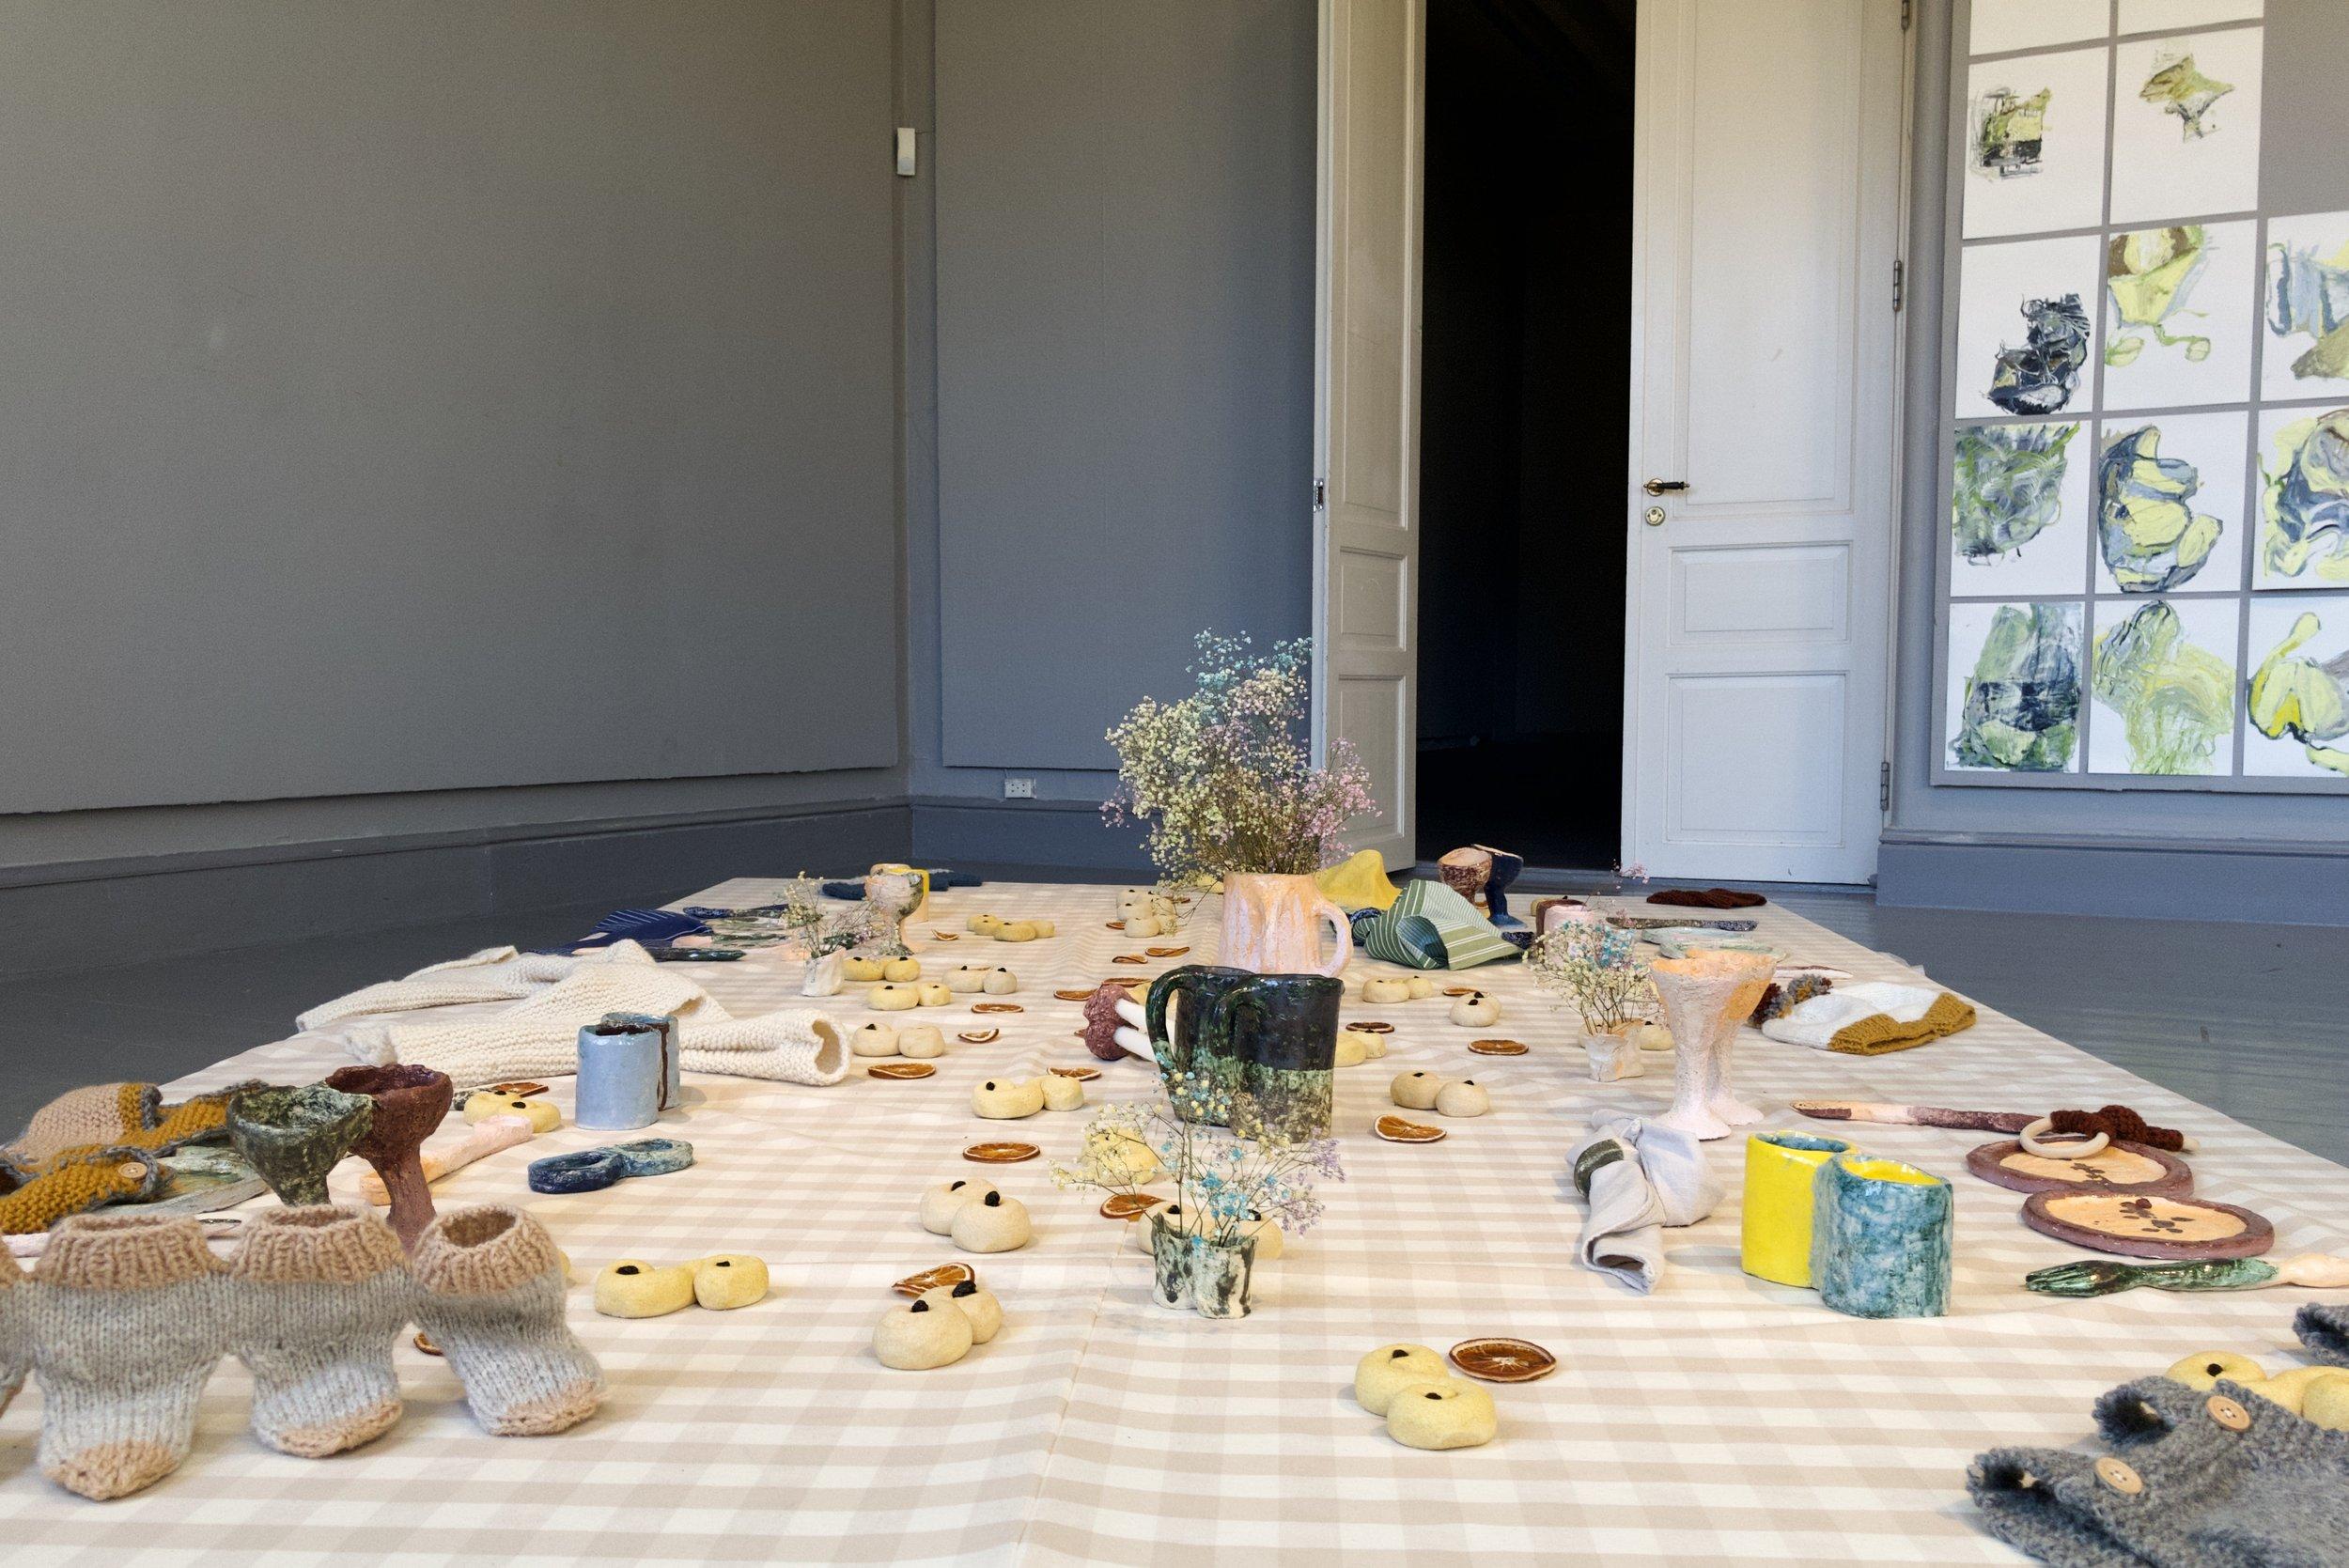 Aasta Marie Tutavae Iversen: Share (2019). Textile, ceramic, papier-mâché, food. Photo: Hilde Sørstrøm